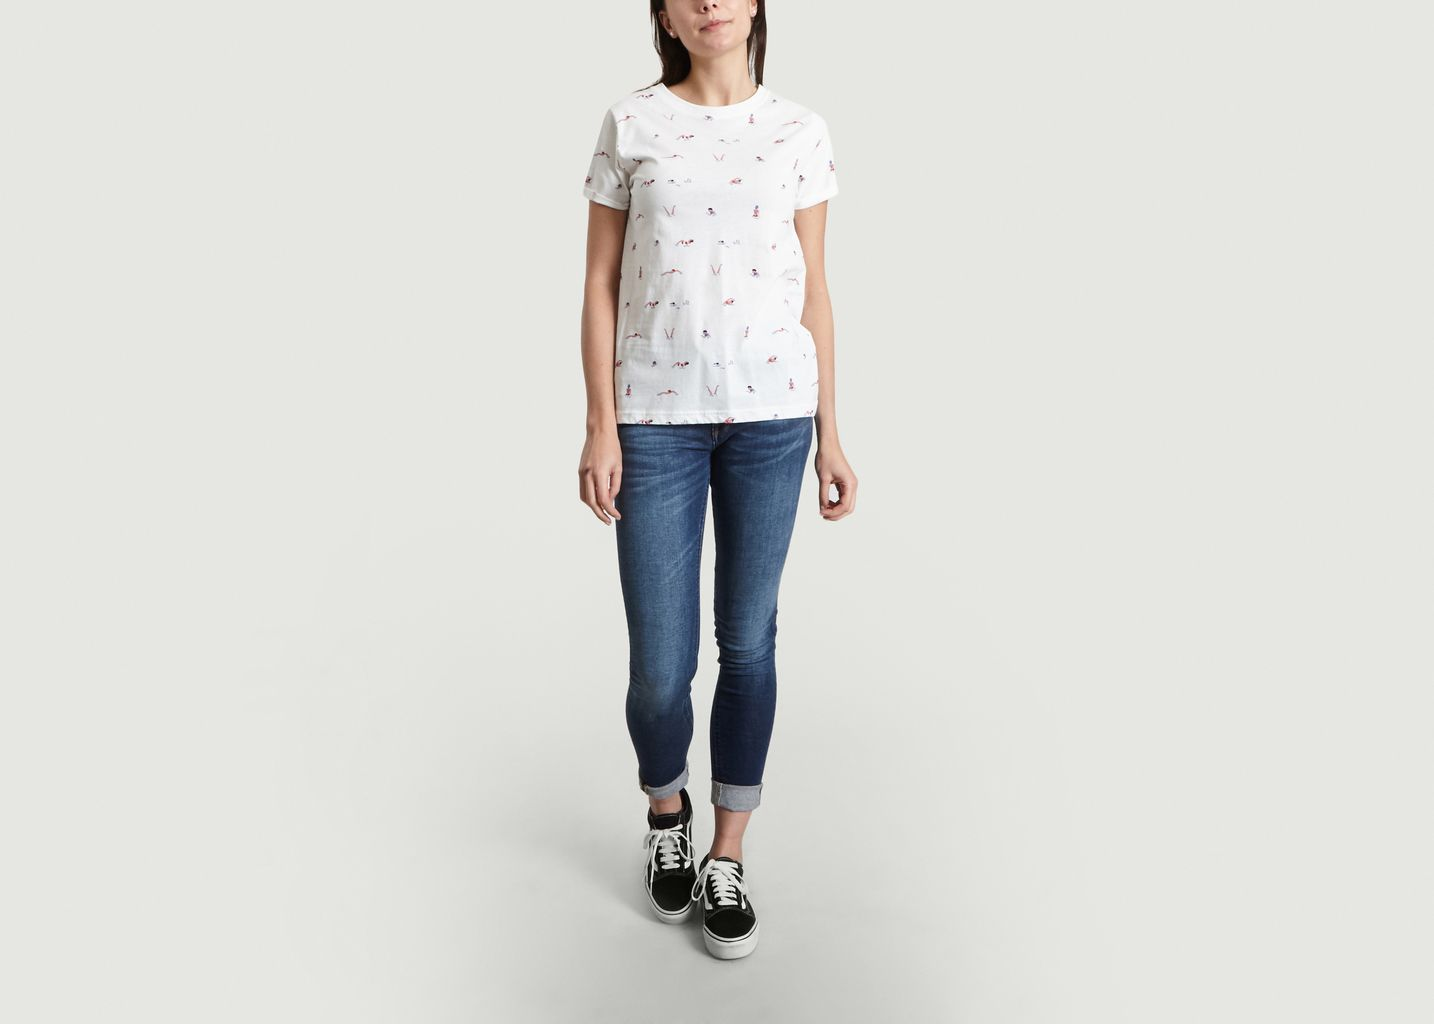 T shirt Nageurs Girl - Olow